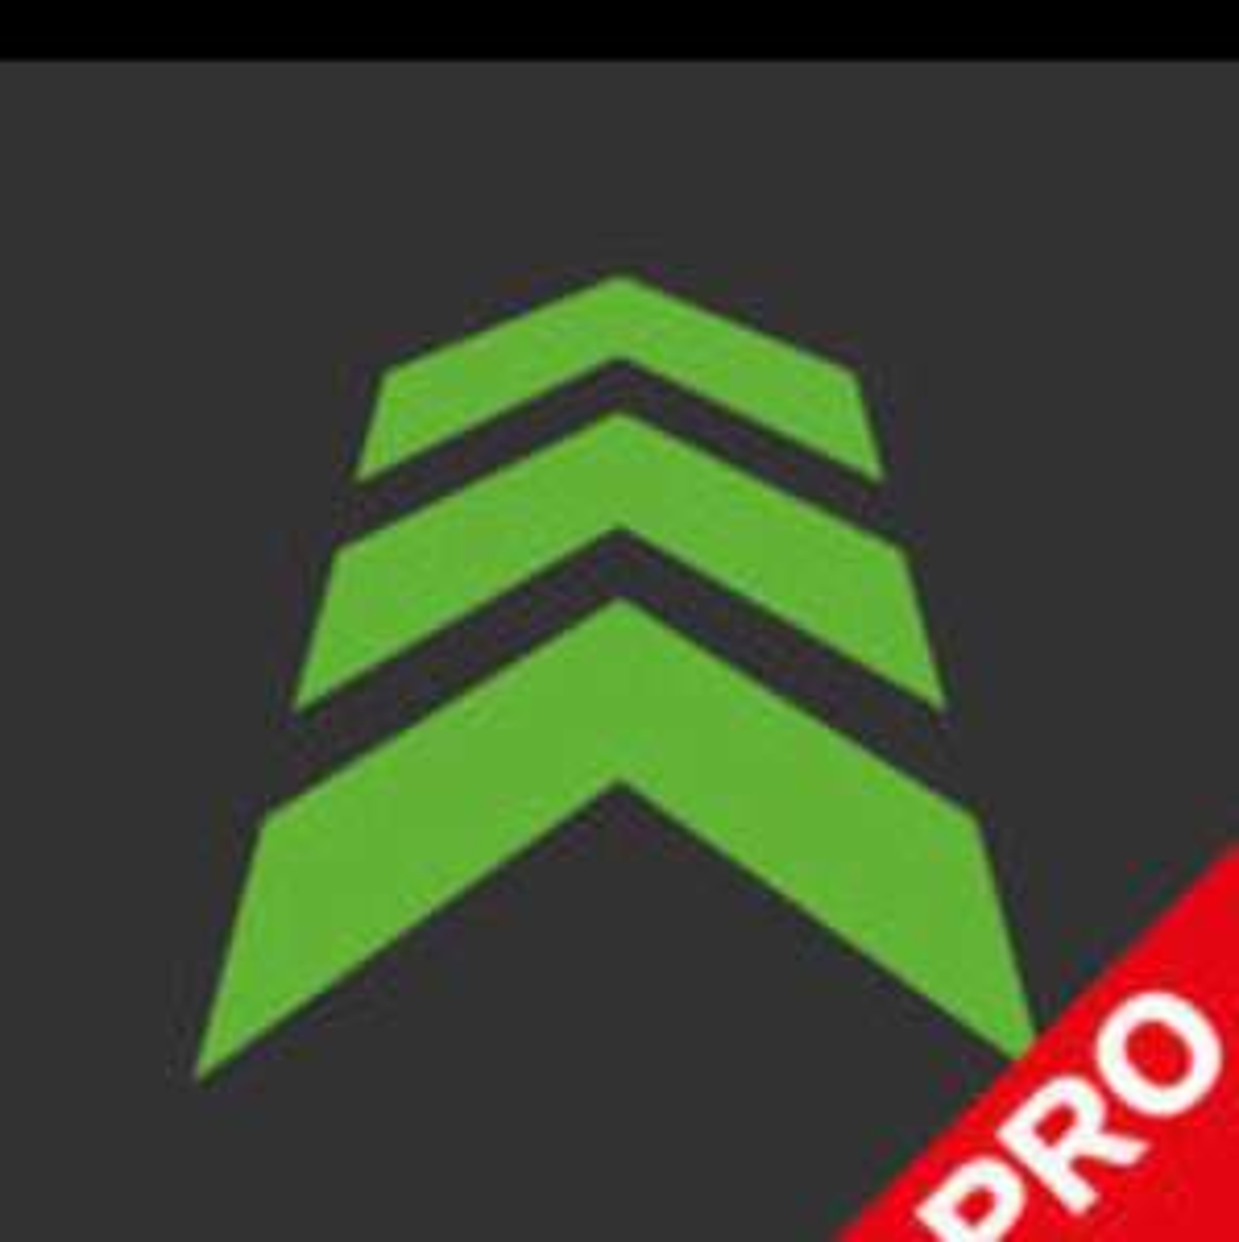 [iOS] Blitzer.de Pro für 0,49€